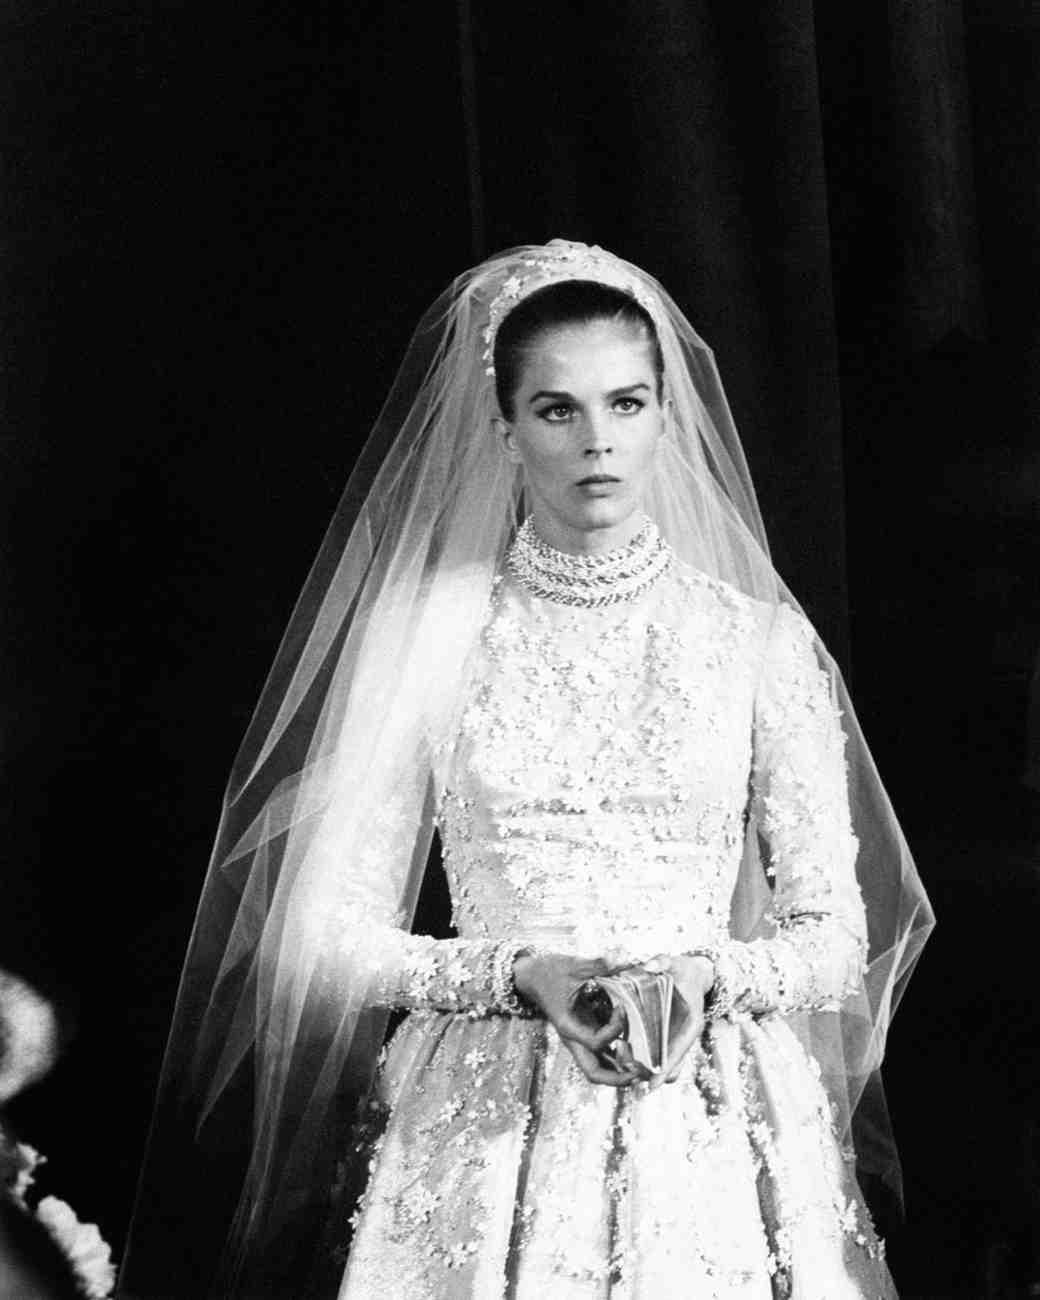 movie-wedding-dresses-the-adventurers-candice-bergen-0316.jpg